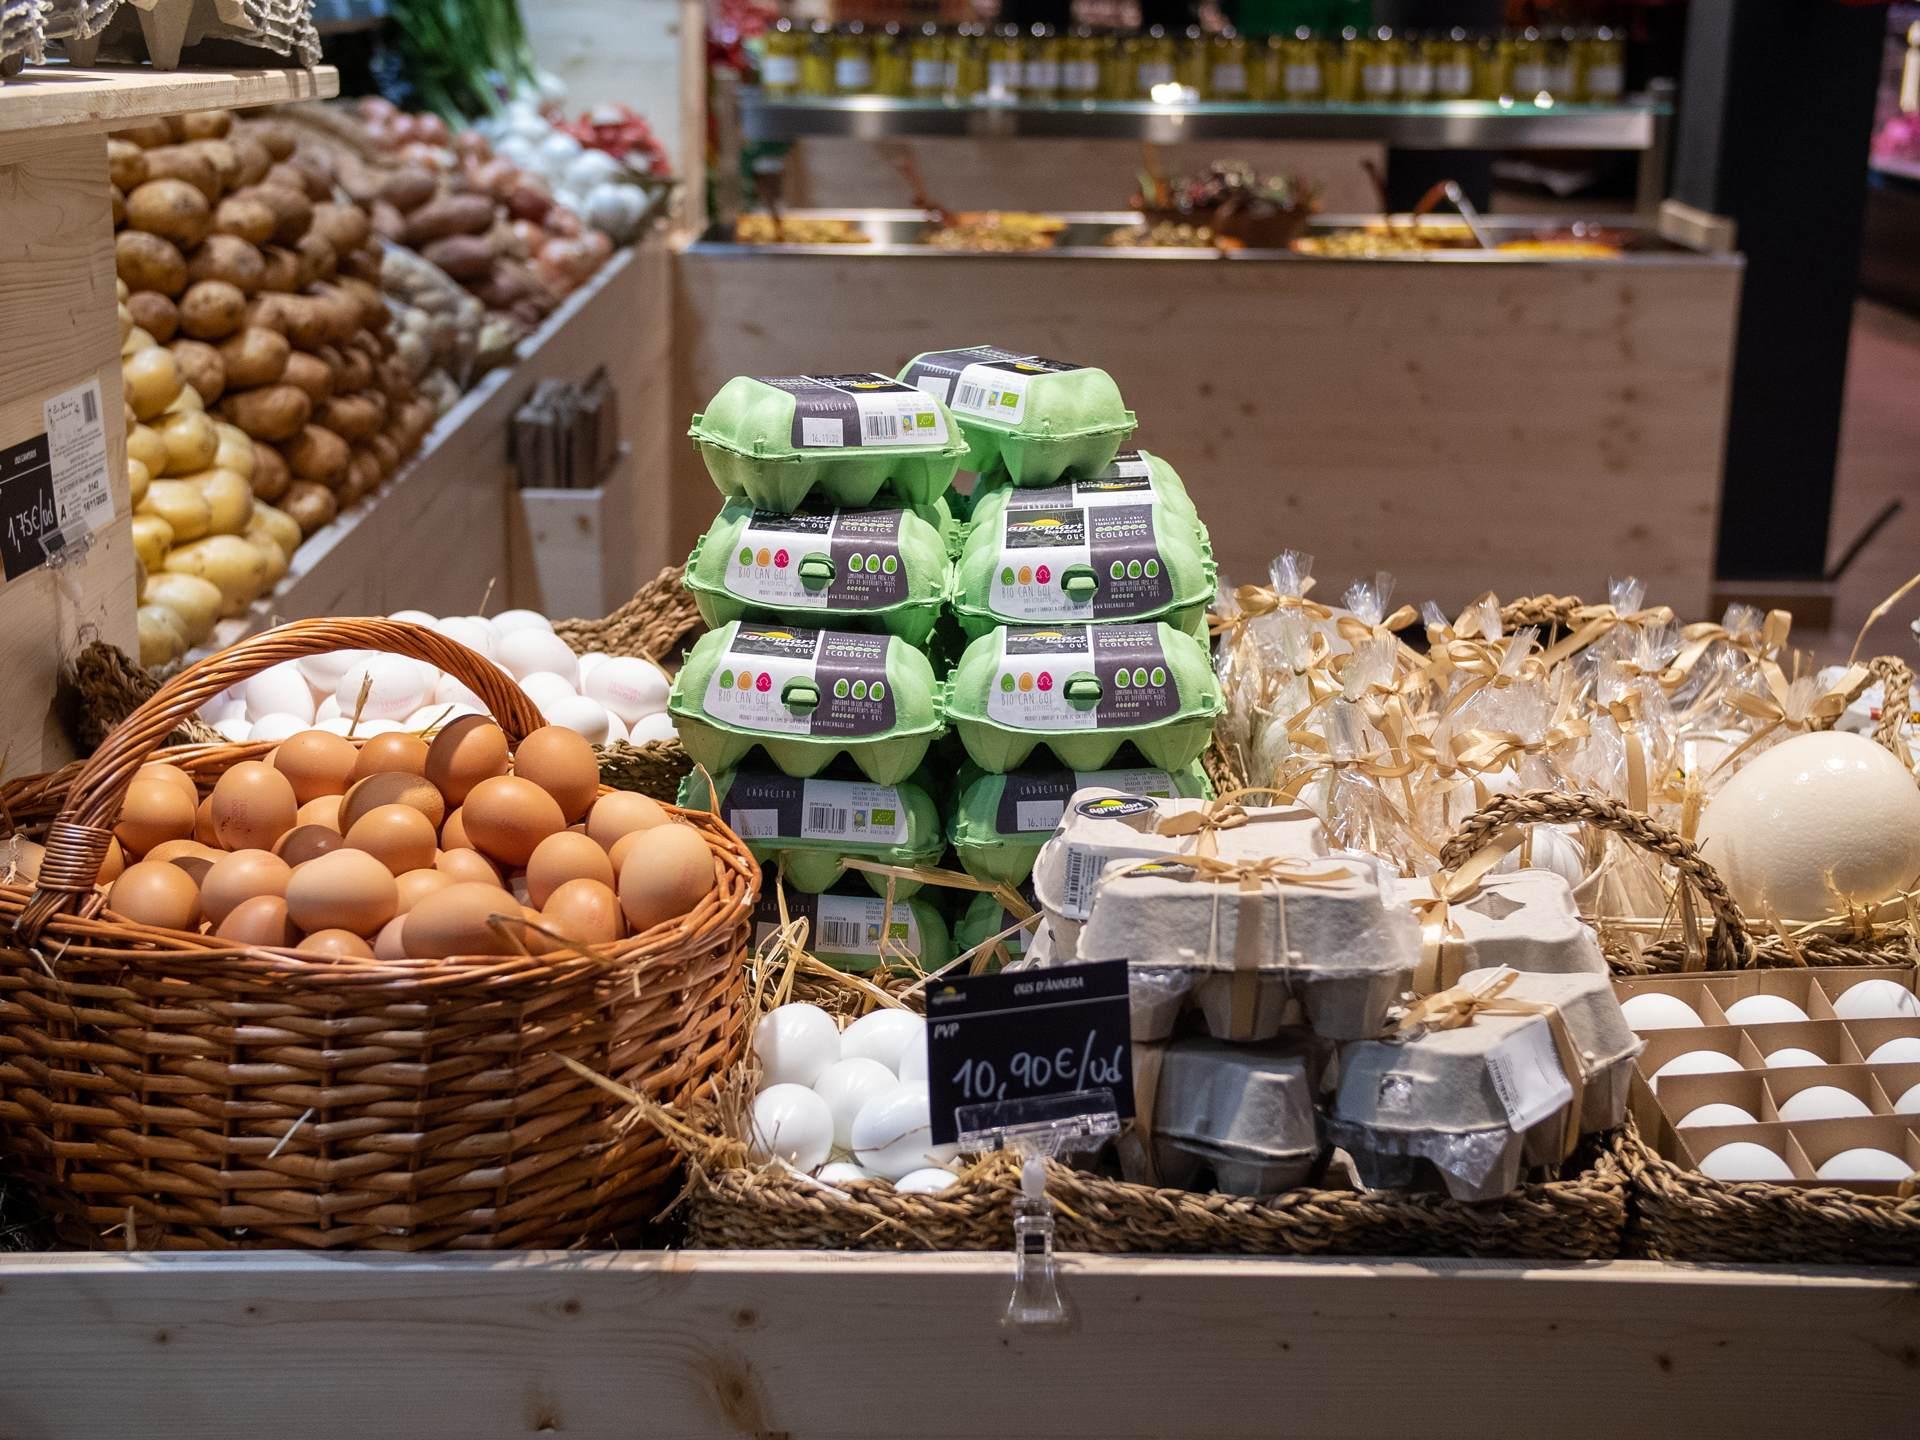 Huevos de alta calidad Agromart